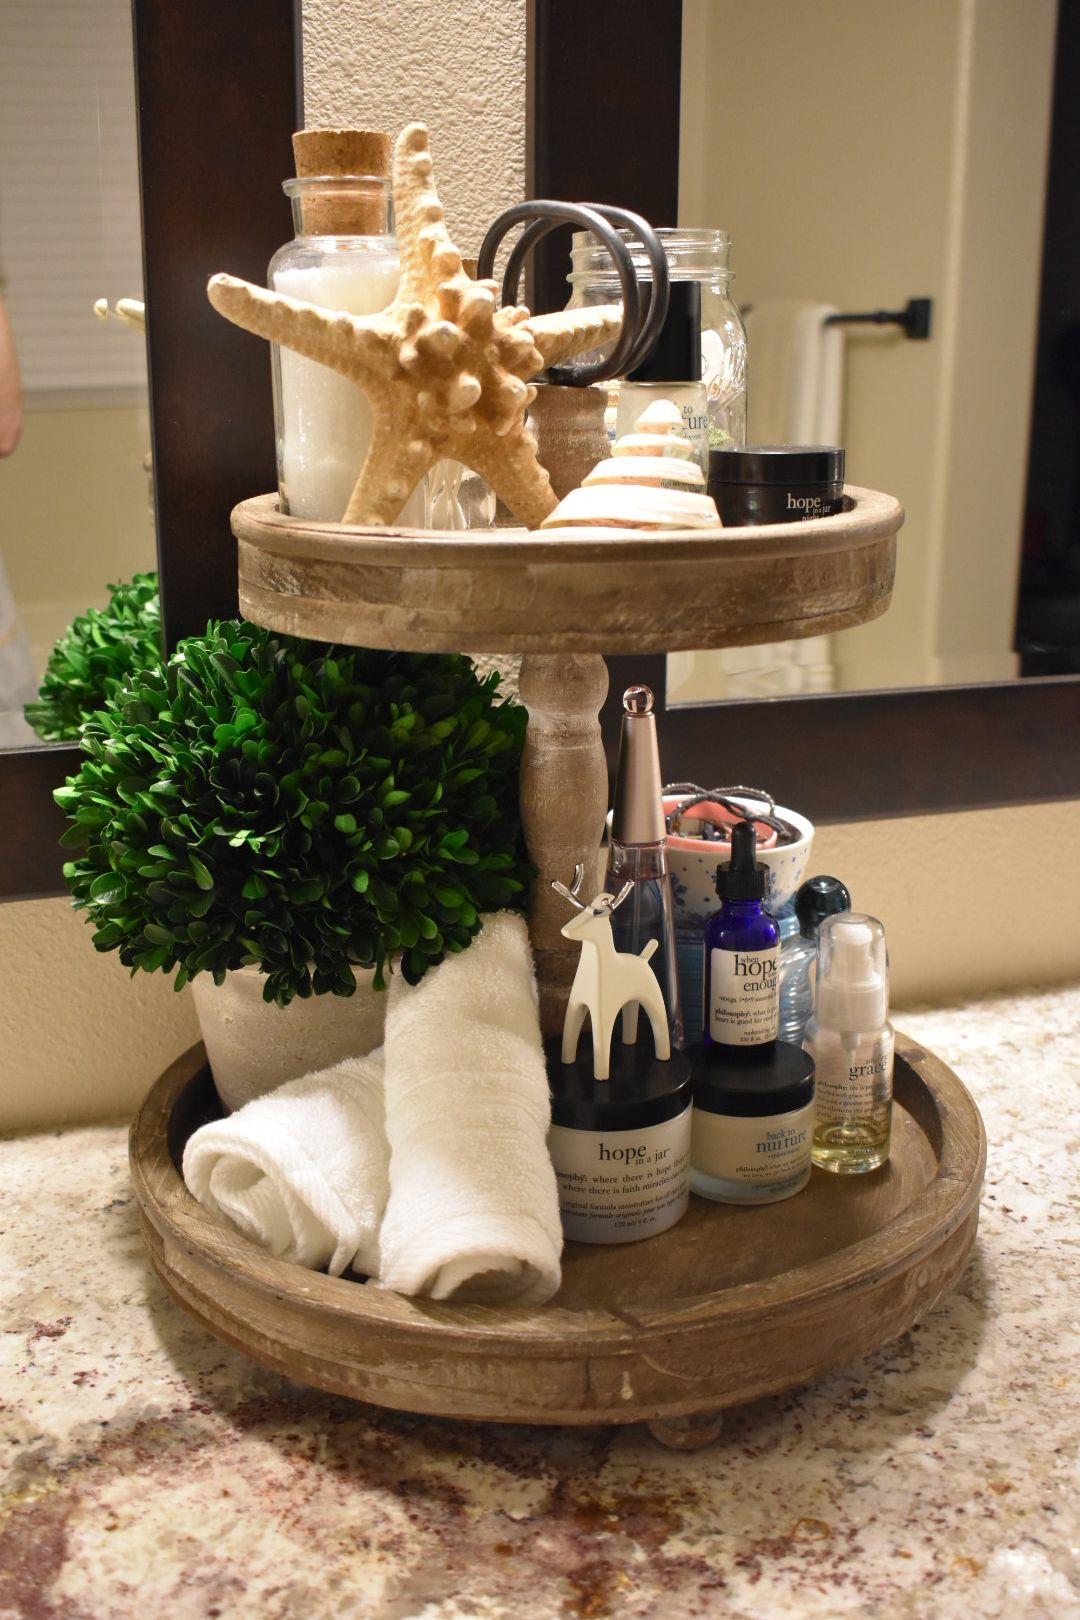 Pin By Kim Pyle On Stuff That Bathroom Vanity Tray Vanity Tray Decor Tray Decor